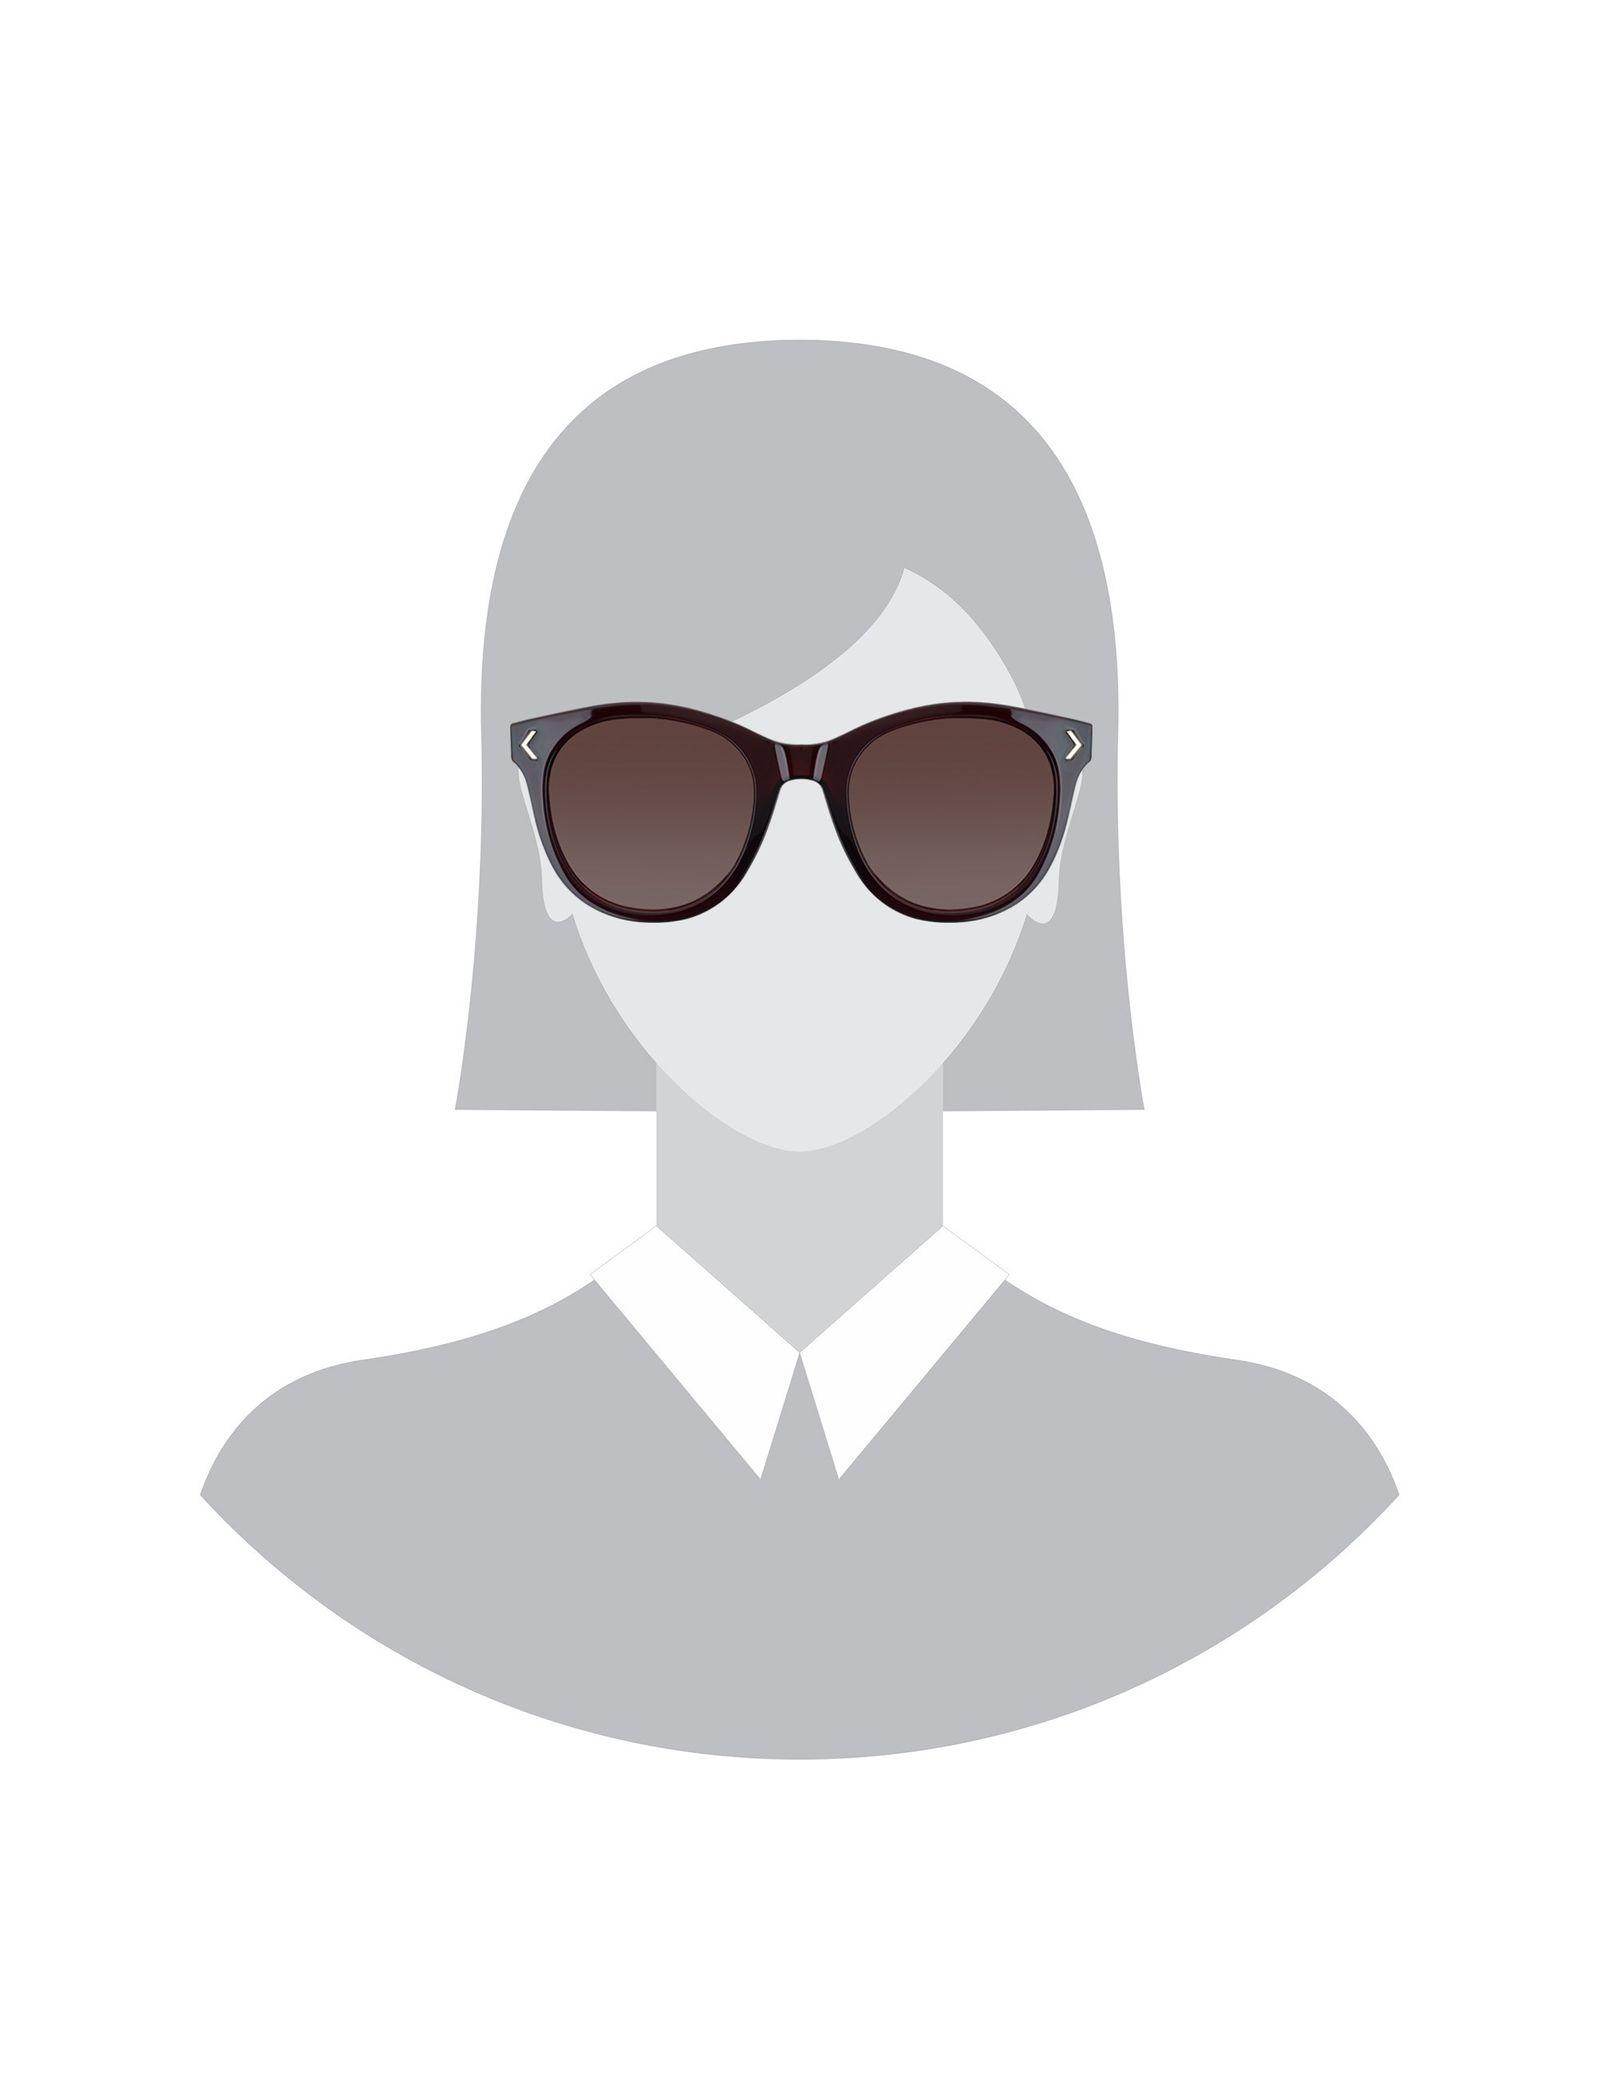 عینک آفتابی ویفرر زنانه - کارن میلن - قهوه اي - 8